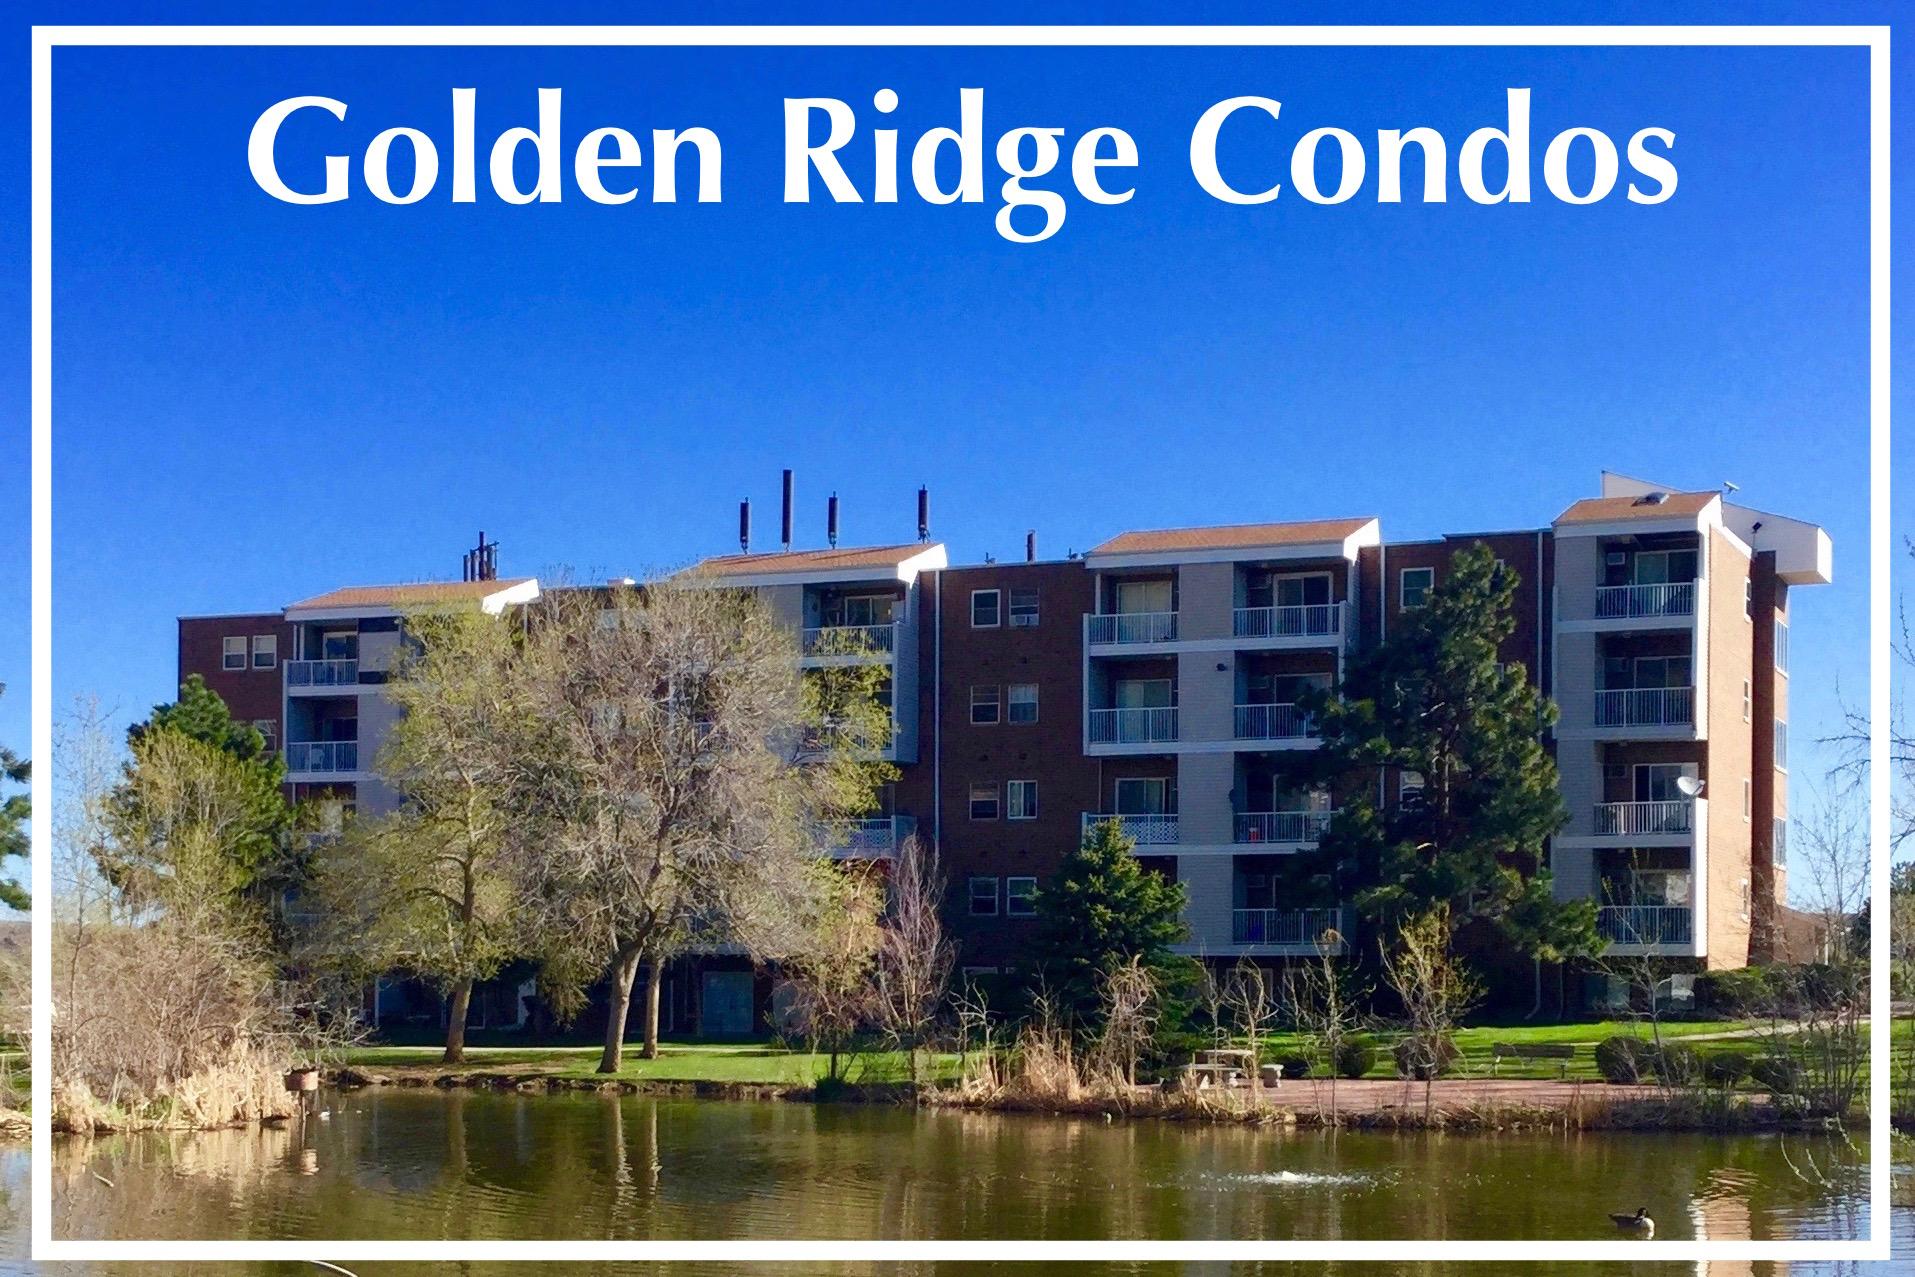 Golden Ridge Condos.jpg